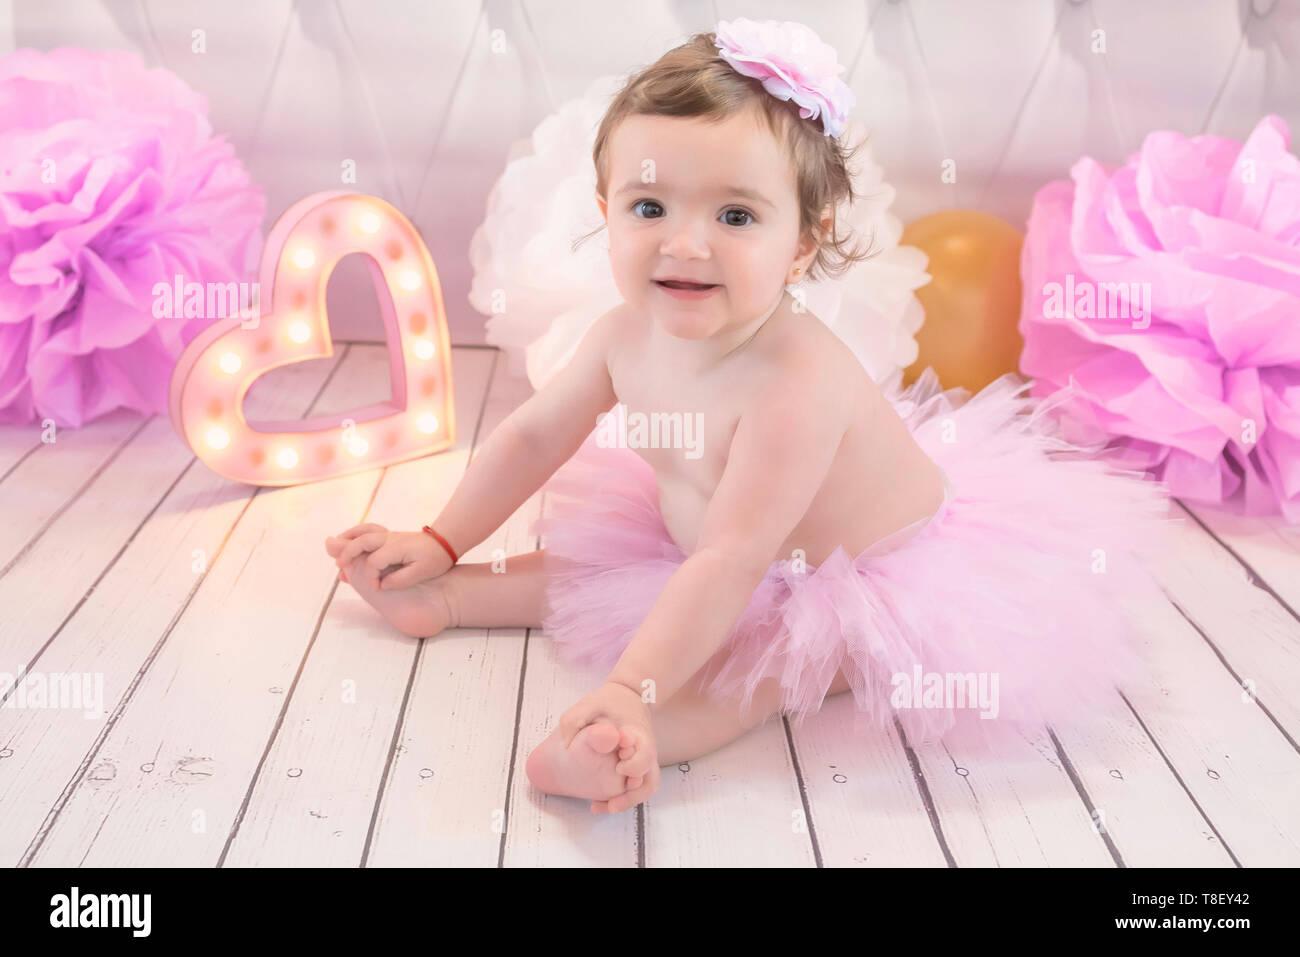 Portrait baby girl in tutu tulle skirt and headband celebrating her first birthday. Child kid sitting on floor. Natural light. Cake smash. - Stock Image